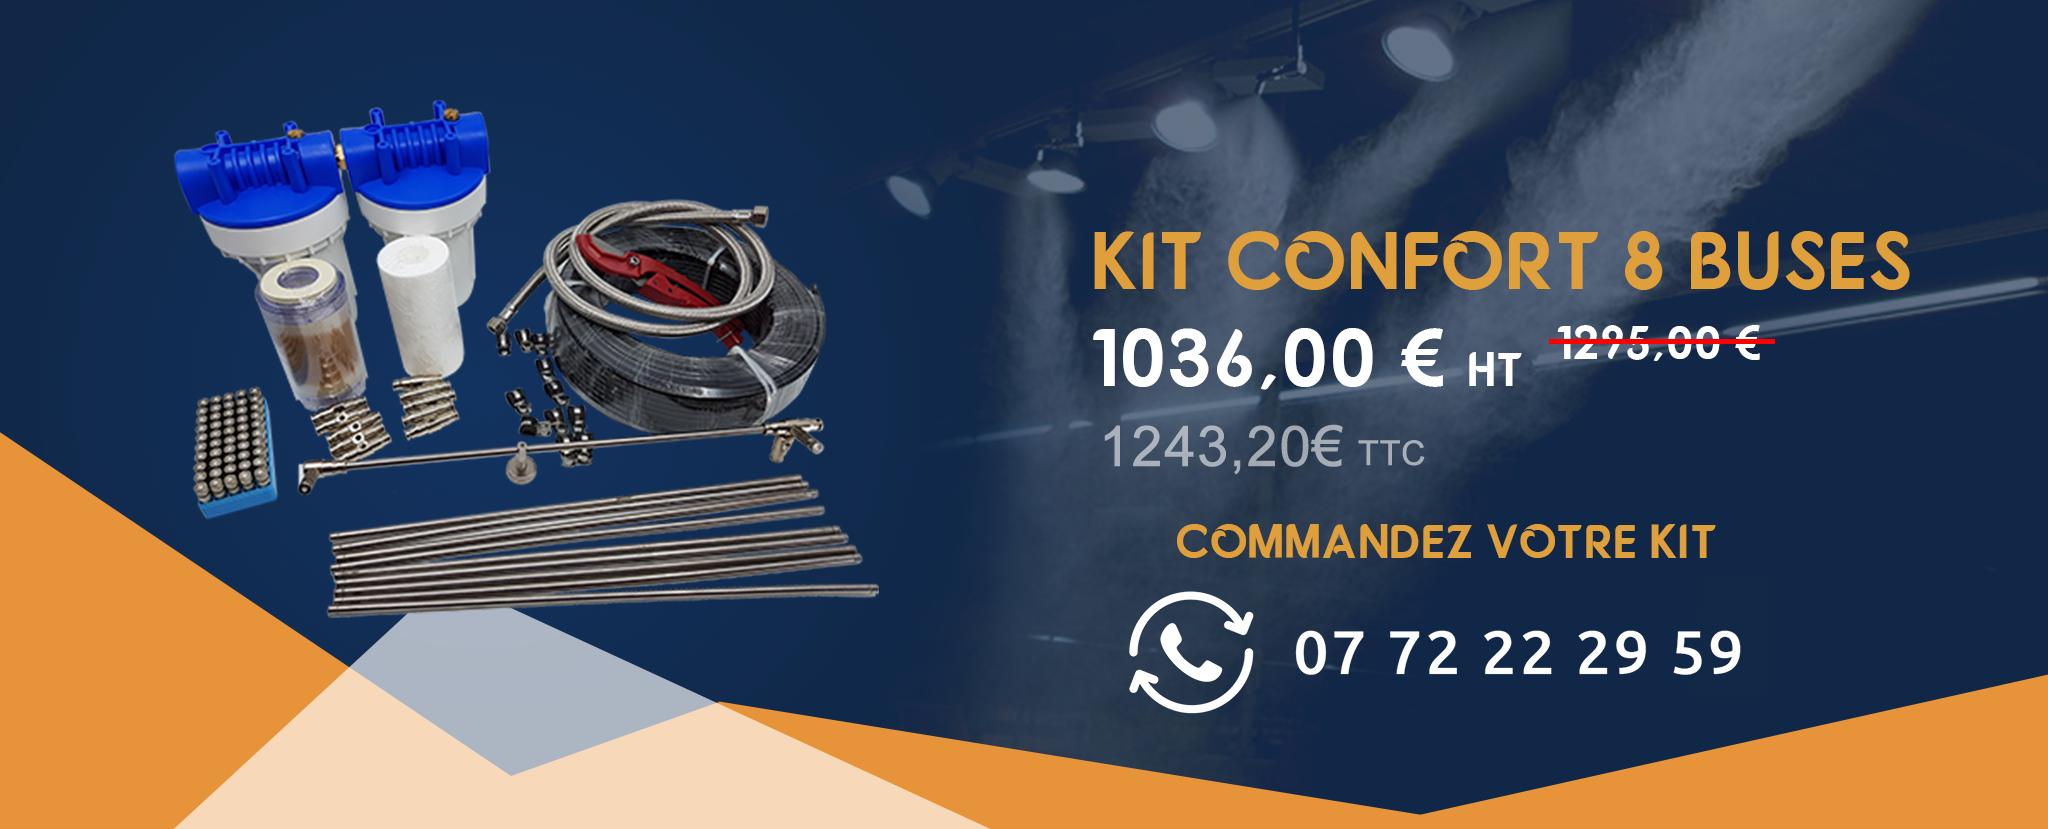 Kit-Confort-8-buses